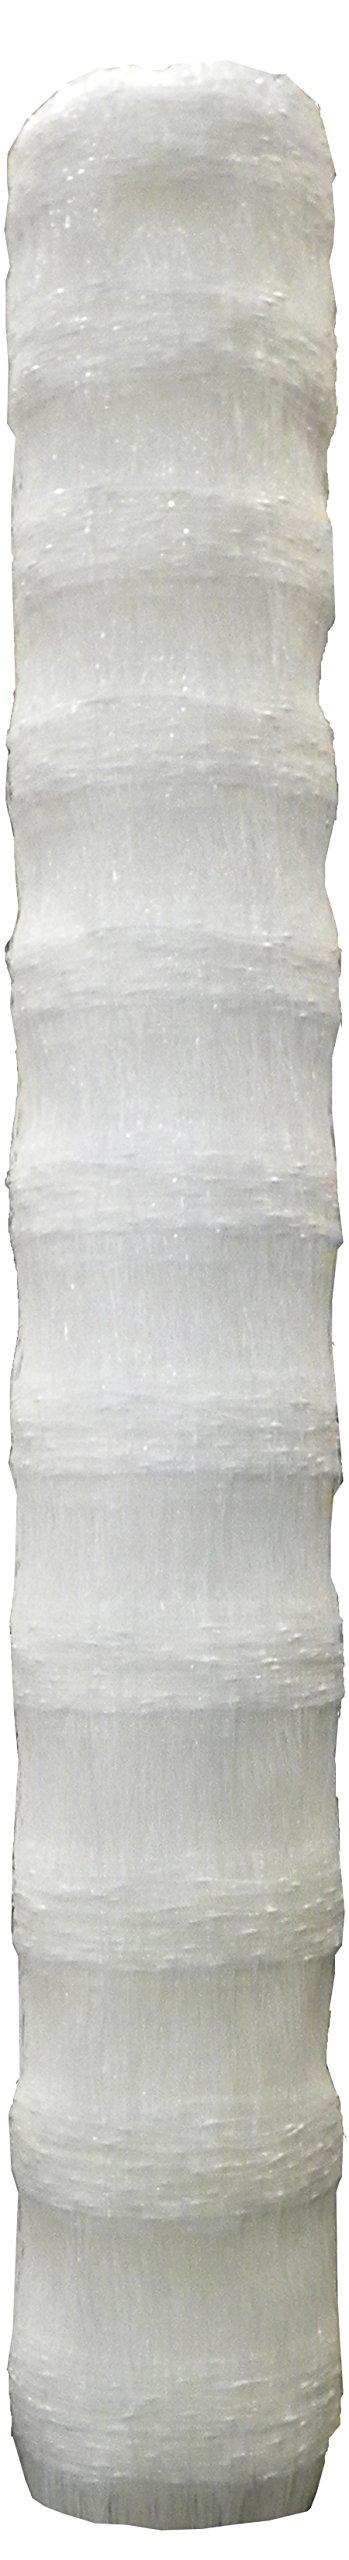 Tenax Hortonova Net, 67-Inch by 3280-Feet